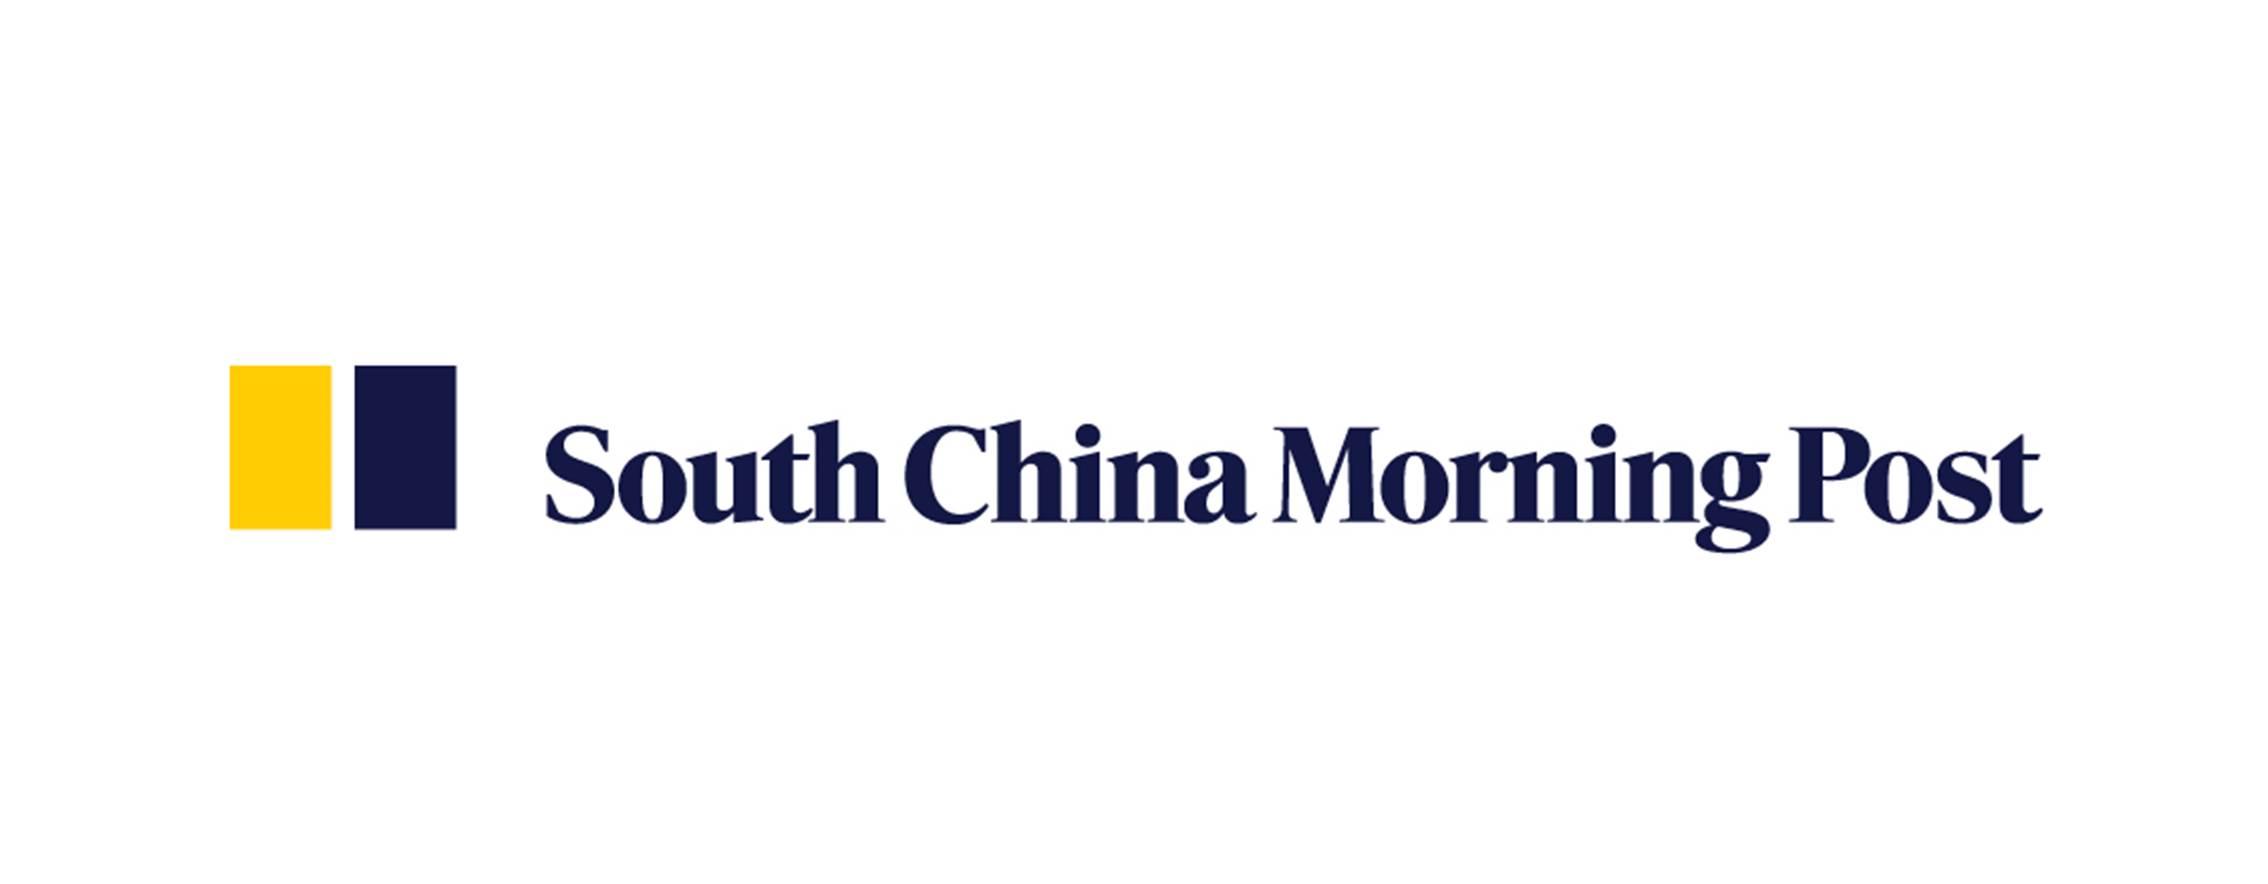 Times Bridge and South China Morning Post Announce Strategic Partnership